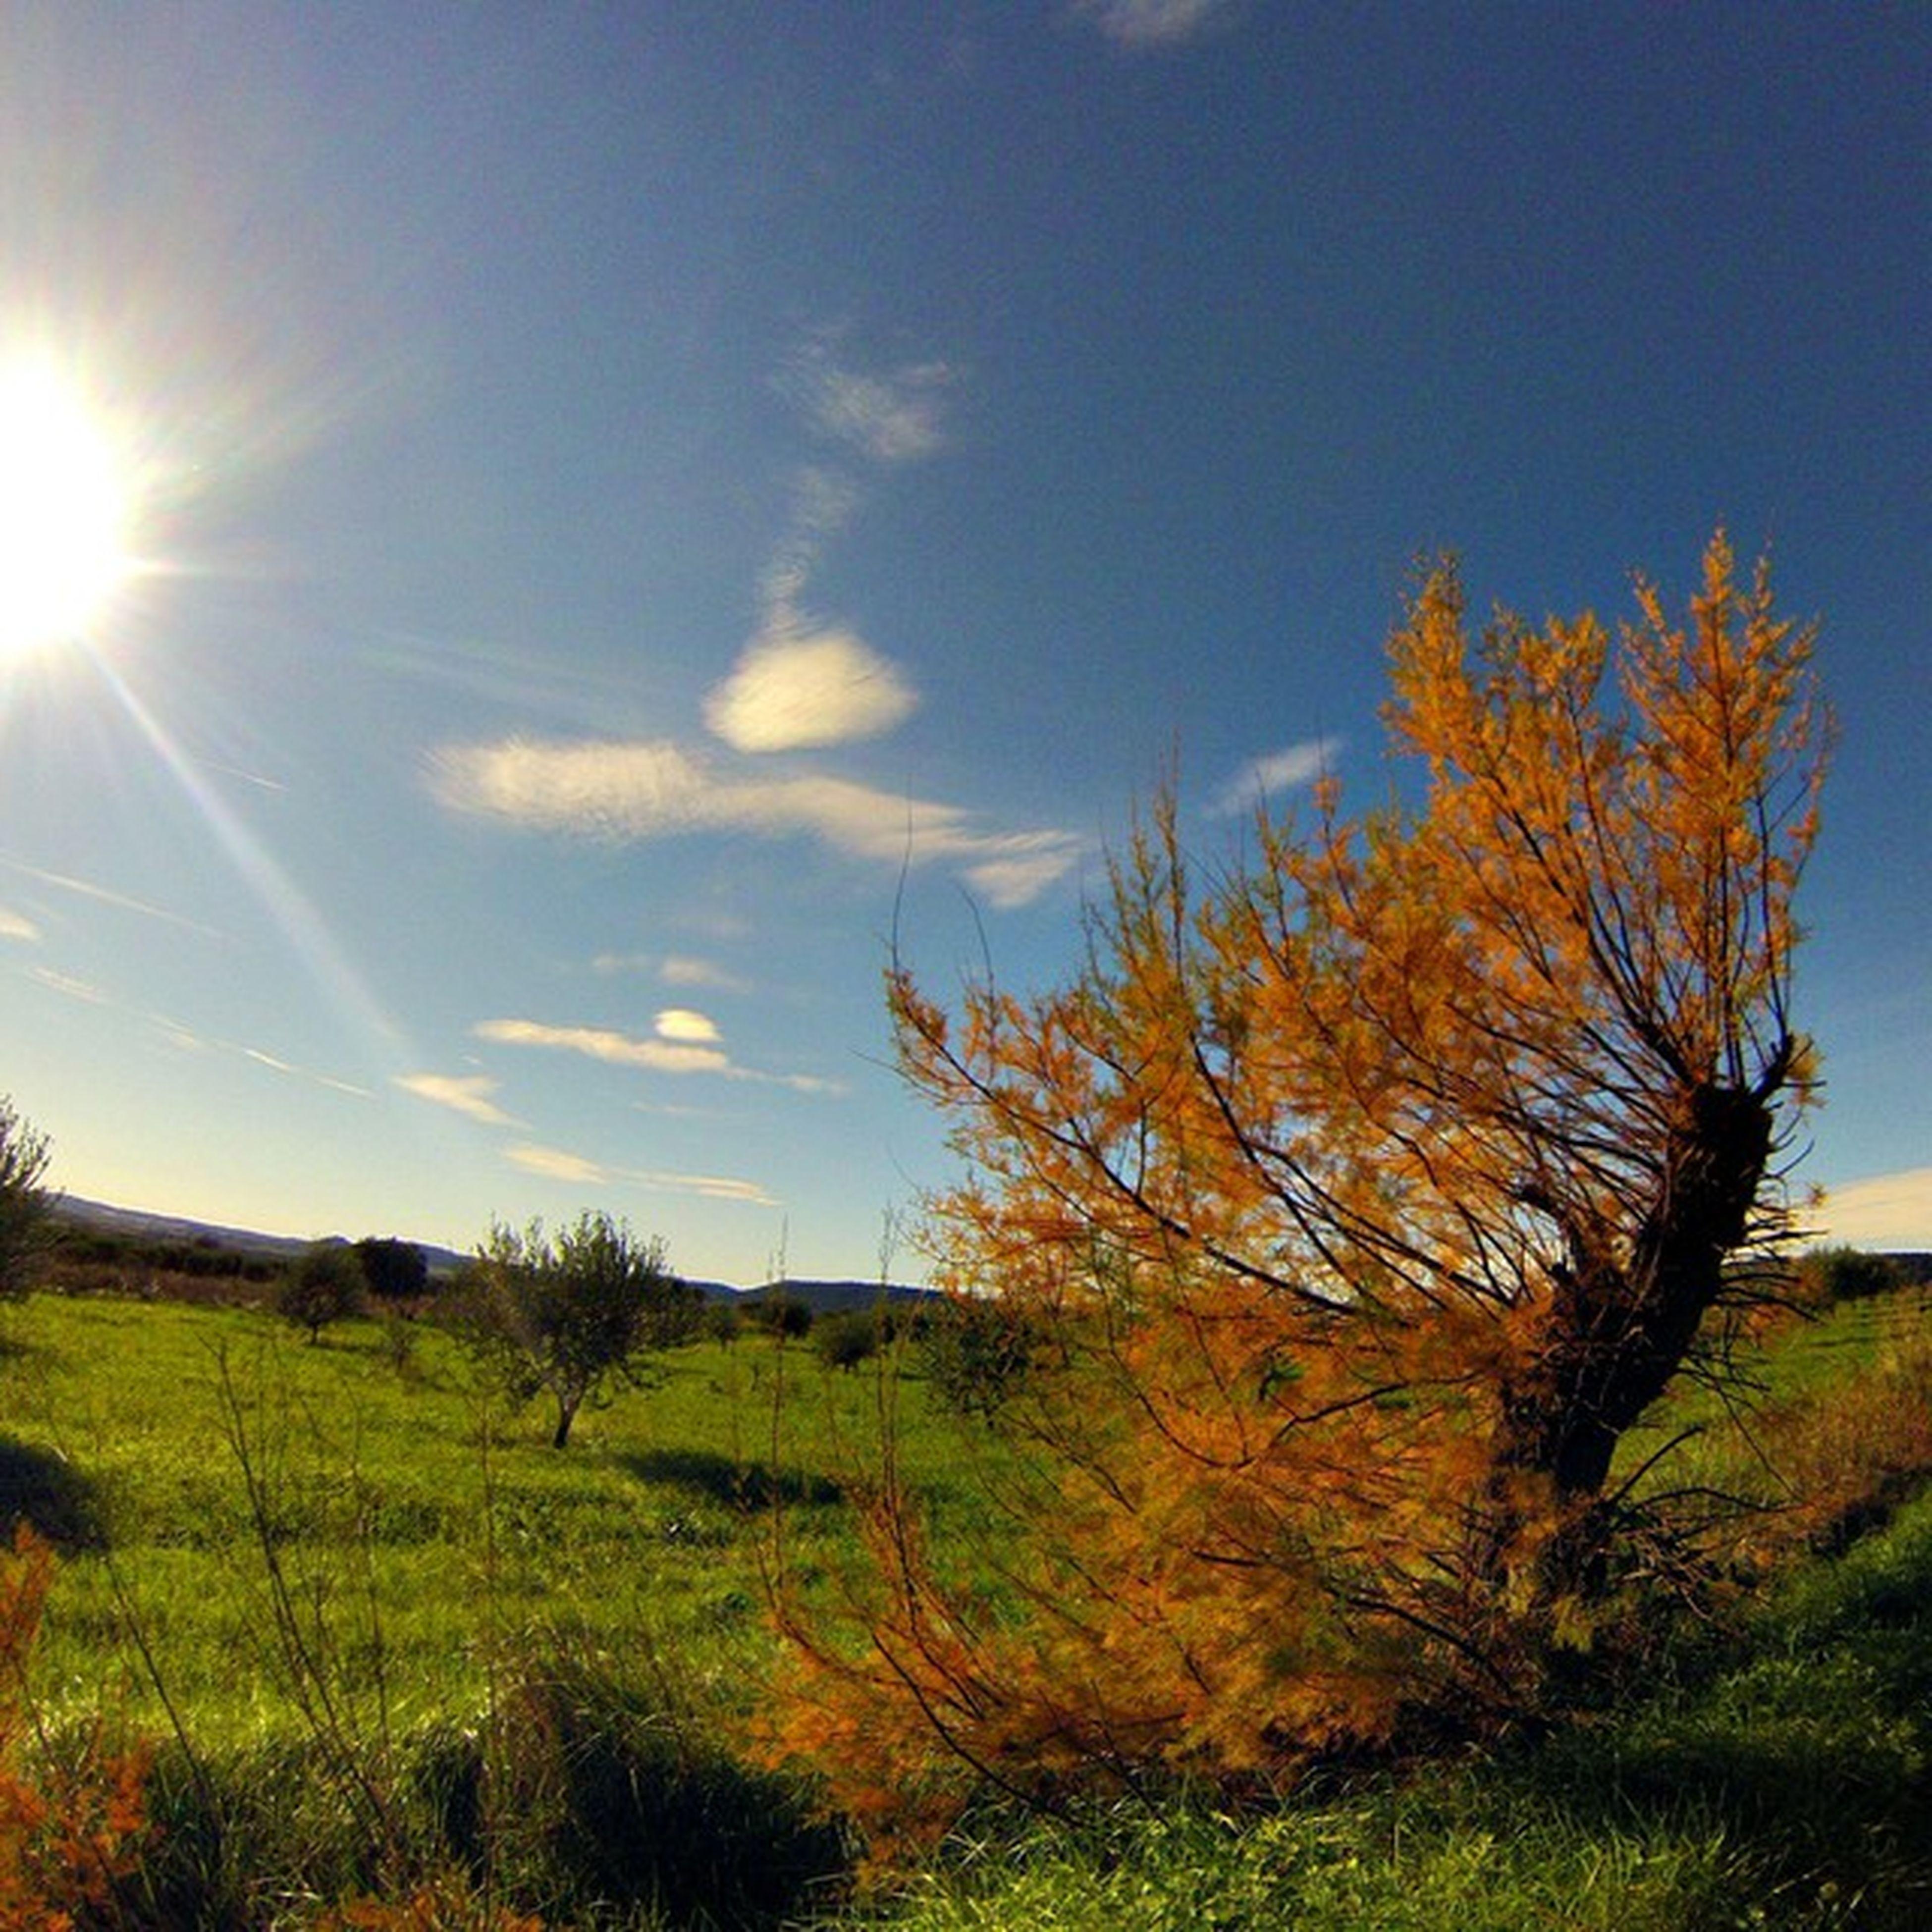 grass, sun, tree, tranquility, tranquil scene, sunlight, sky, sunbeam, field, beauty in nature, landscape, scenics, grassy, nature, growth, lens flare, blue, green color, idyllic, non-urban scene